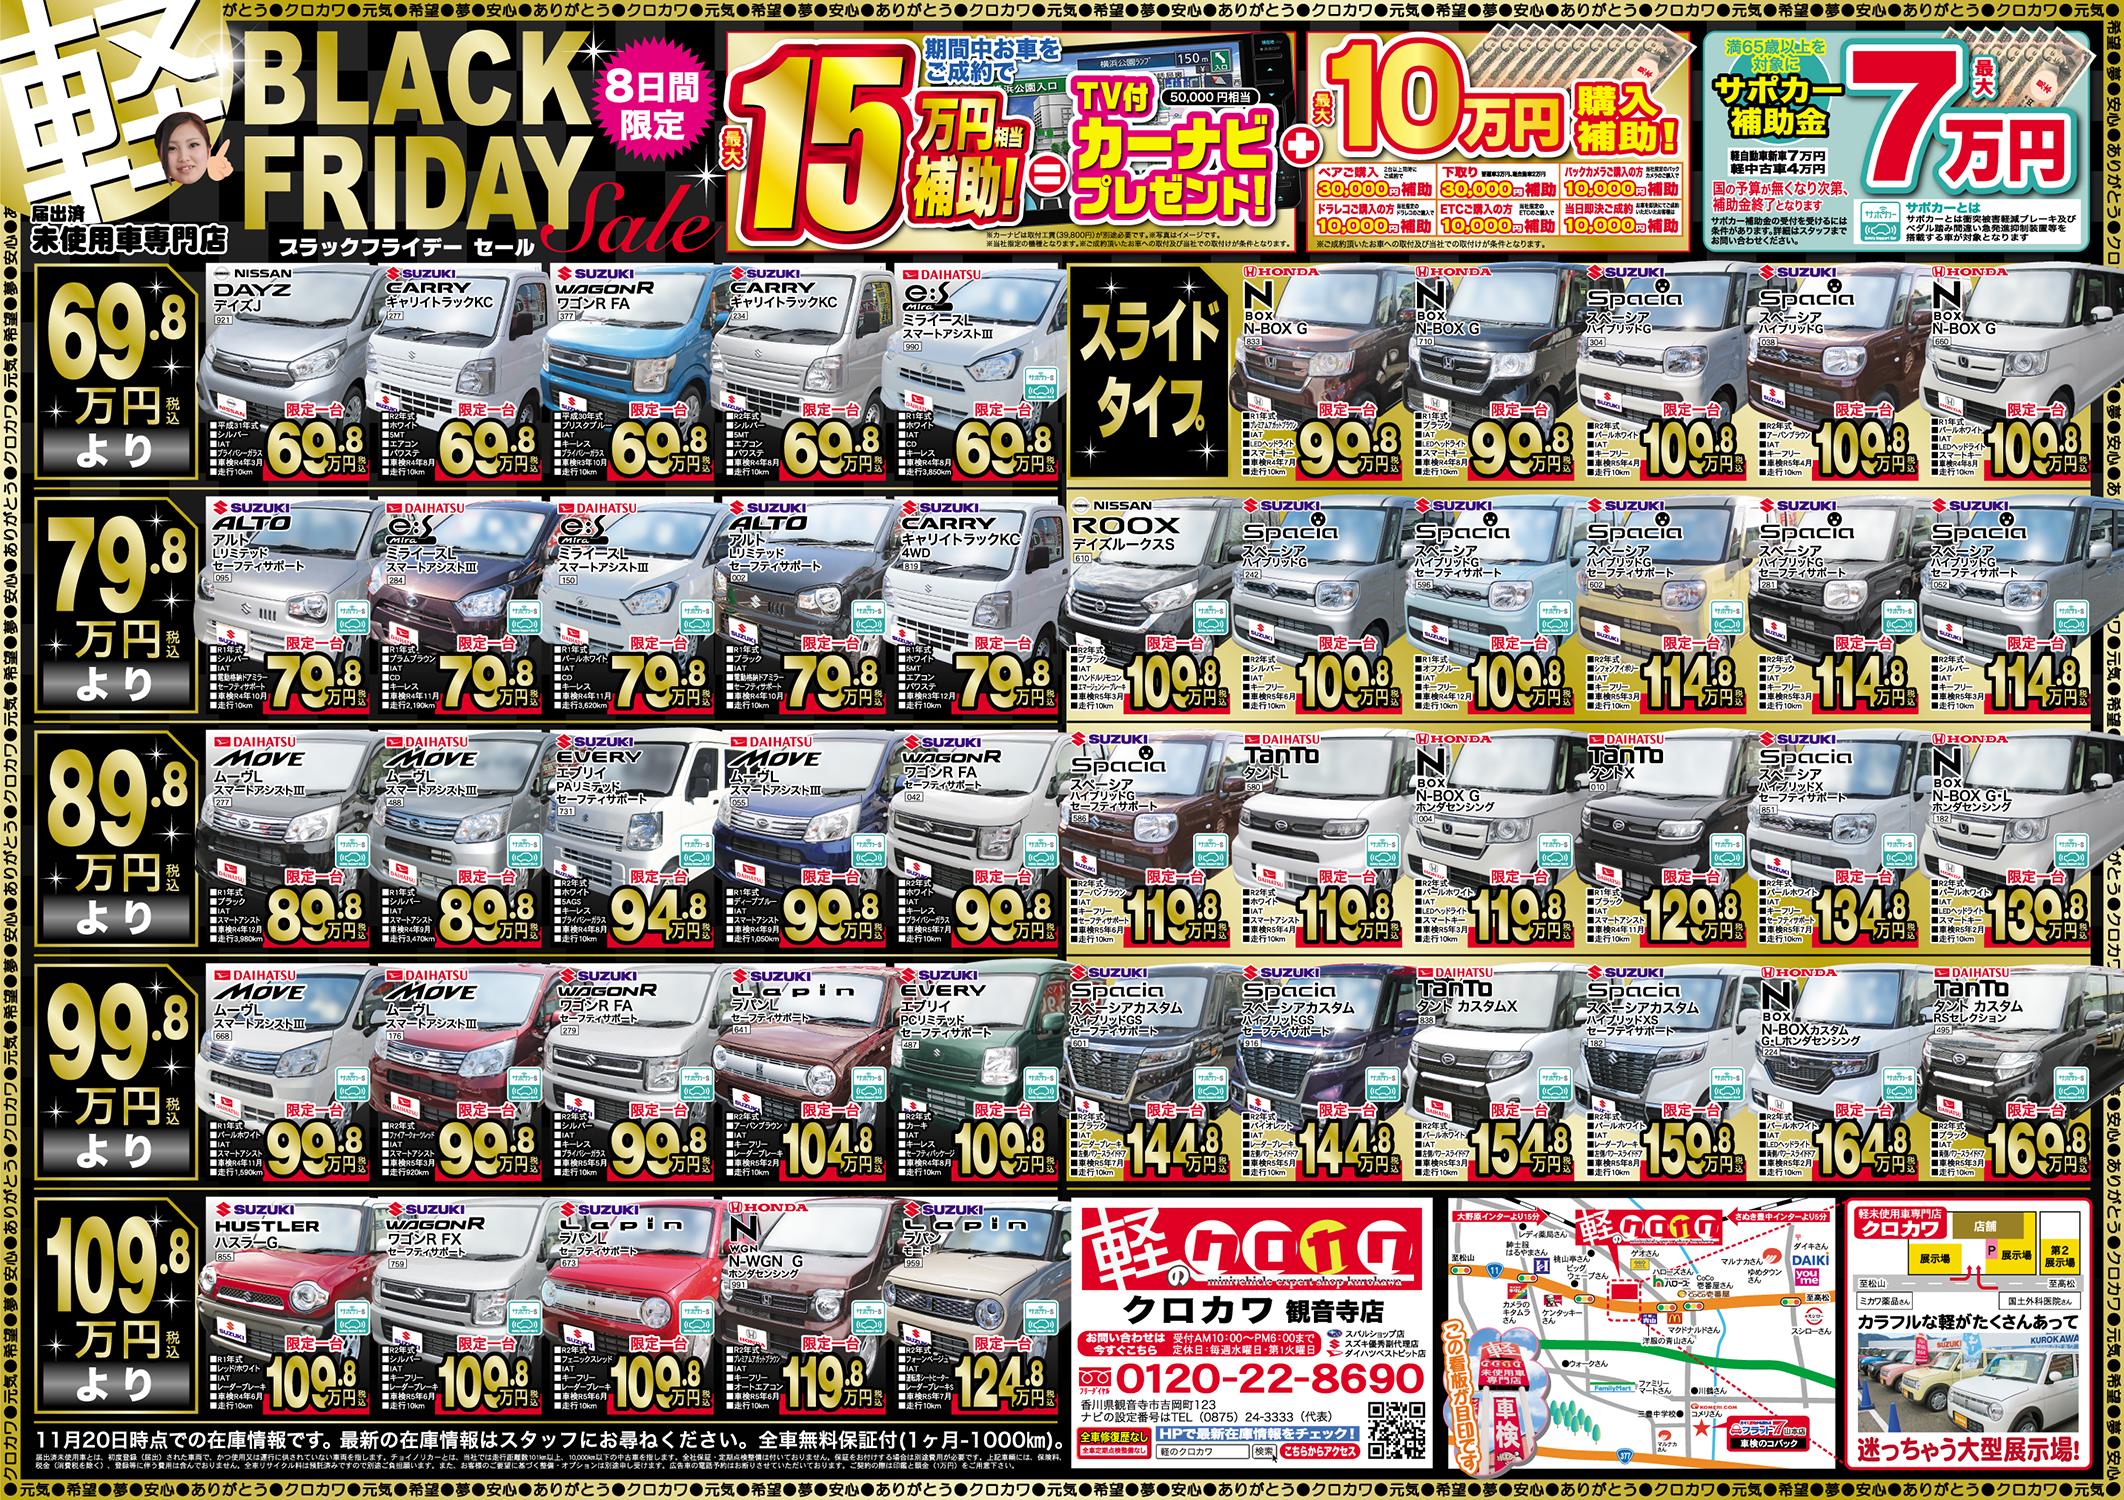 【BLACK FRIDAY SALE】限定目玉車49.8万円〜